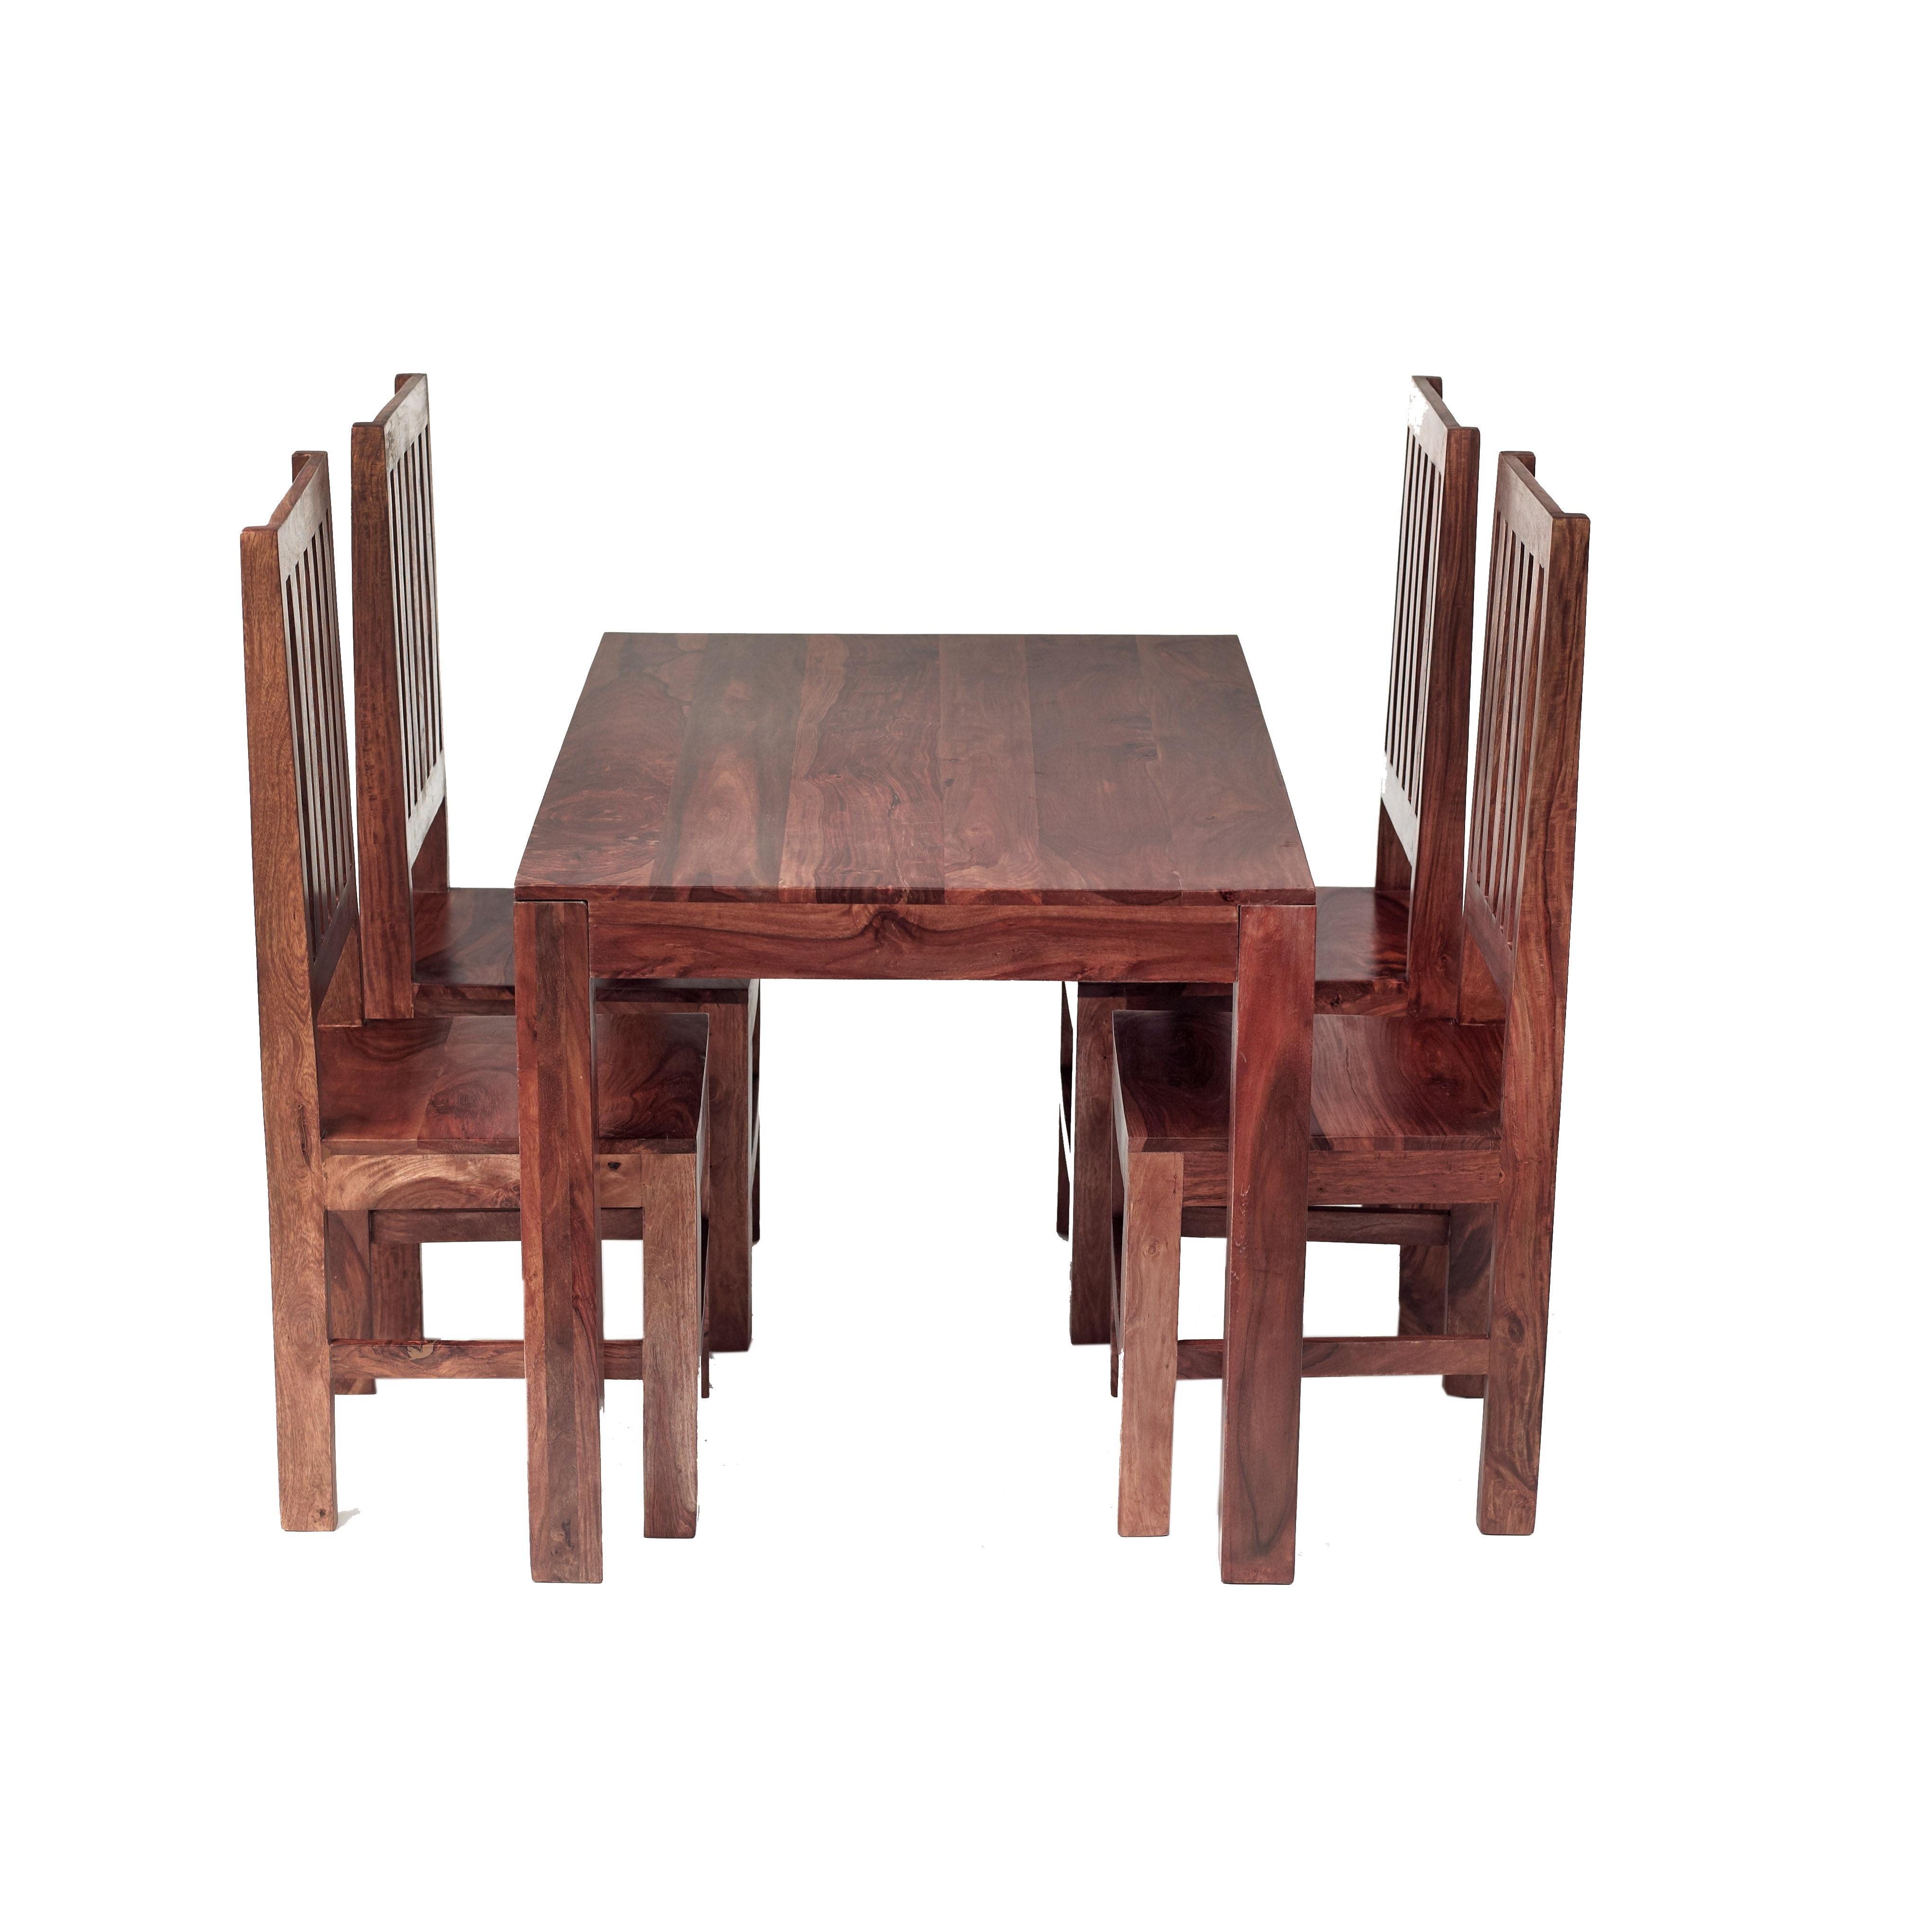 Prestington Cube Sheesham Dining Table And 4 Chairs & Reviews Inside 2017 Sheesham Dining Chairs (View 23 of 25)